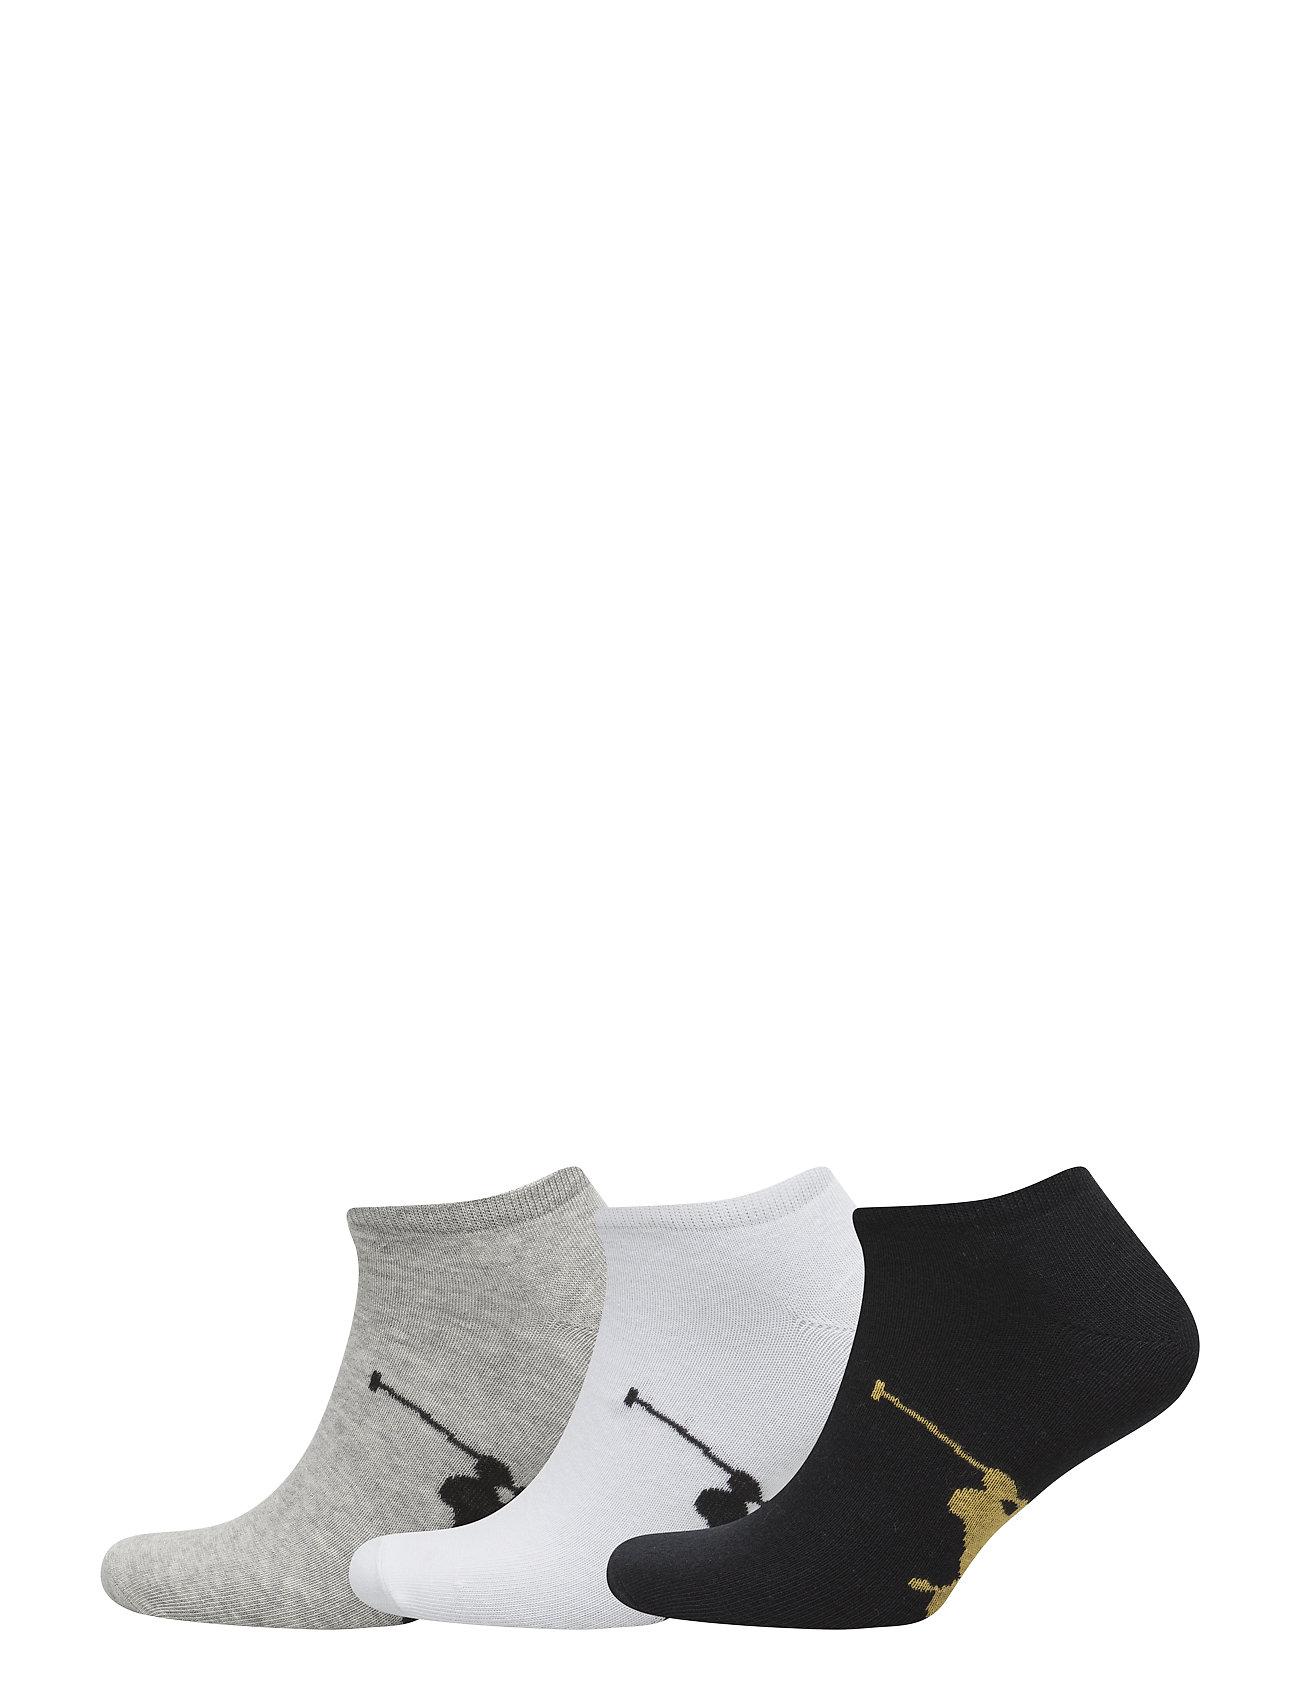 Polo Ralph Lauren Underwear BPP SOLE-PED-3 PACK - ASSORTED